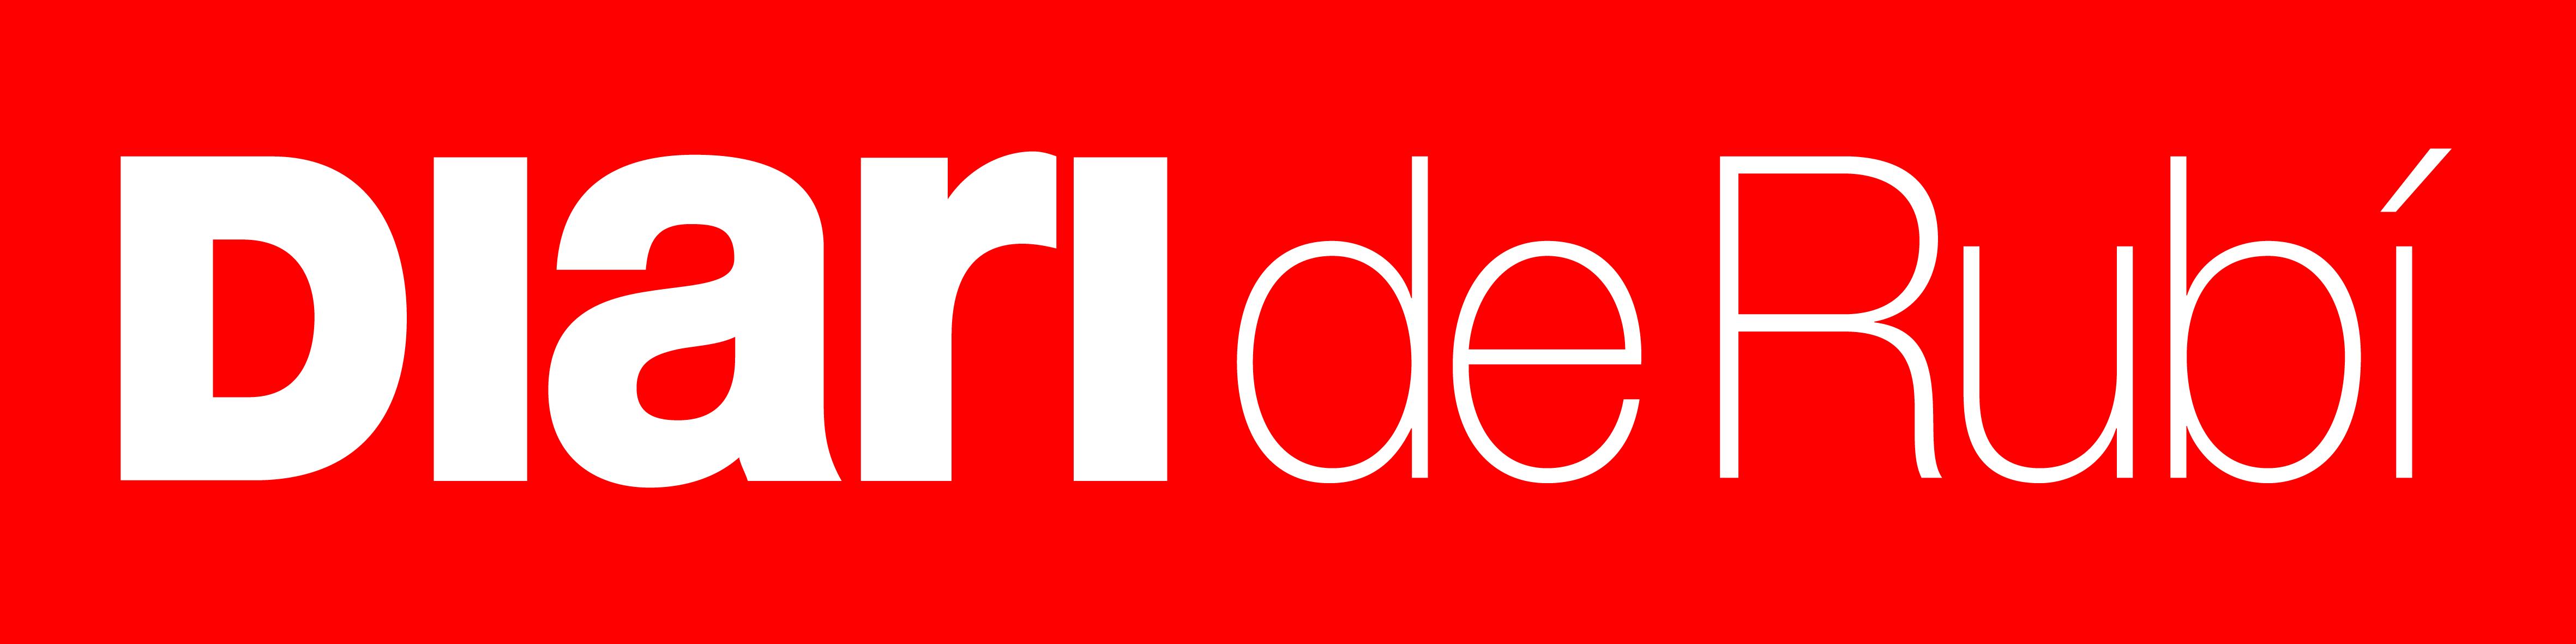 diari logo cabecera 2020 WEB